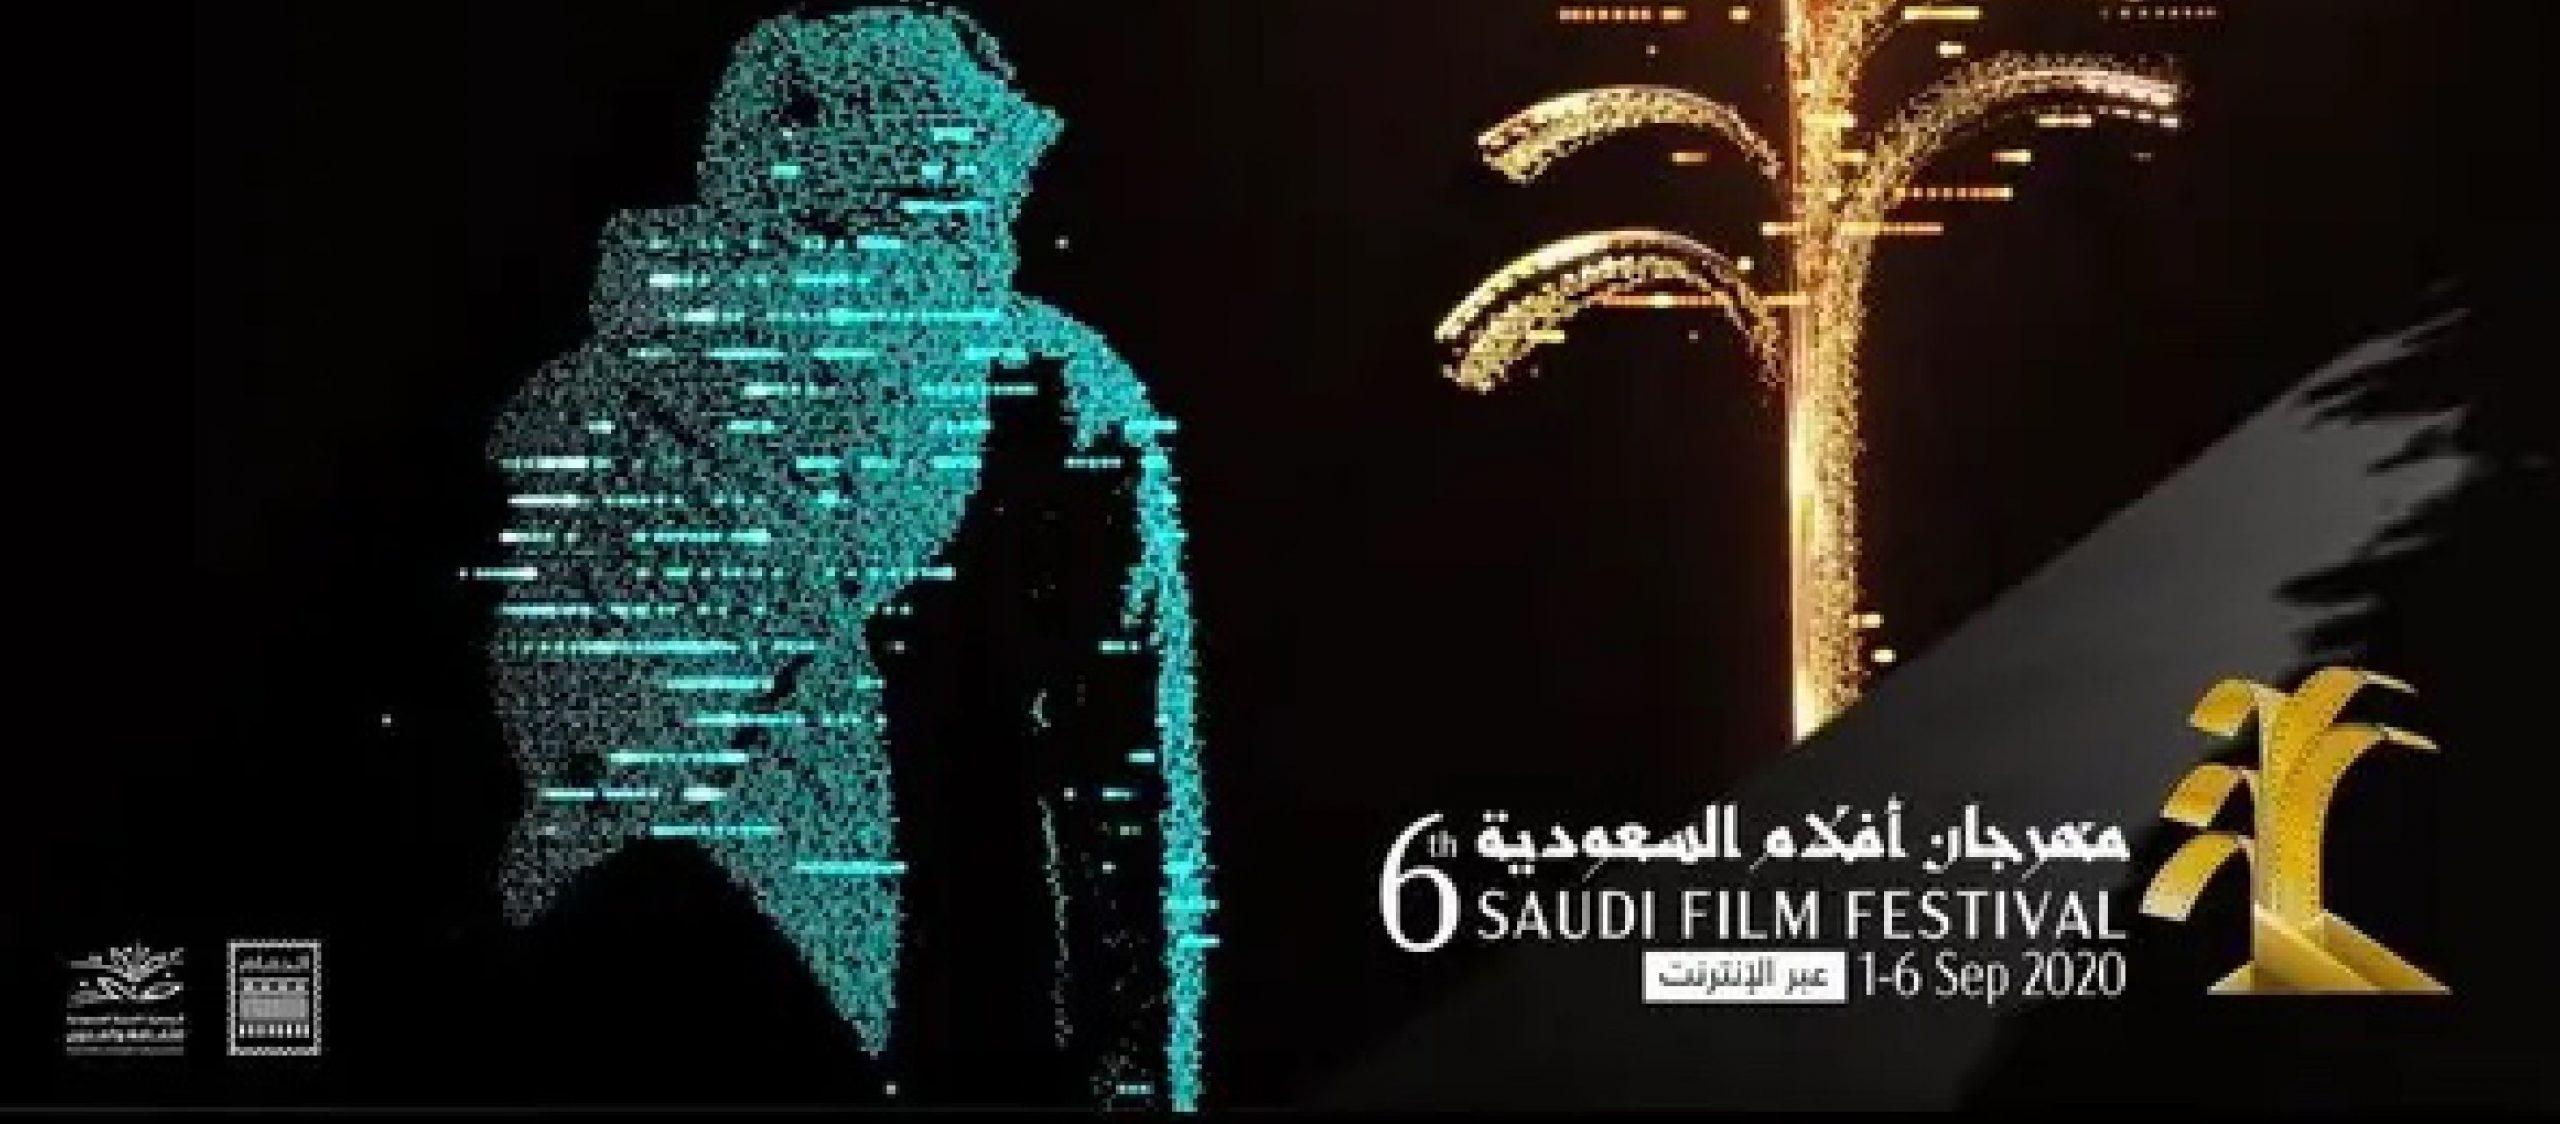 Saudi Film Festival kicks off sixth edition virtually, to stream 54 films